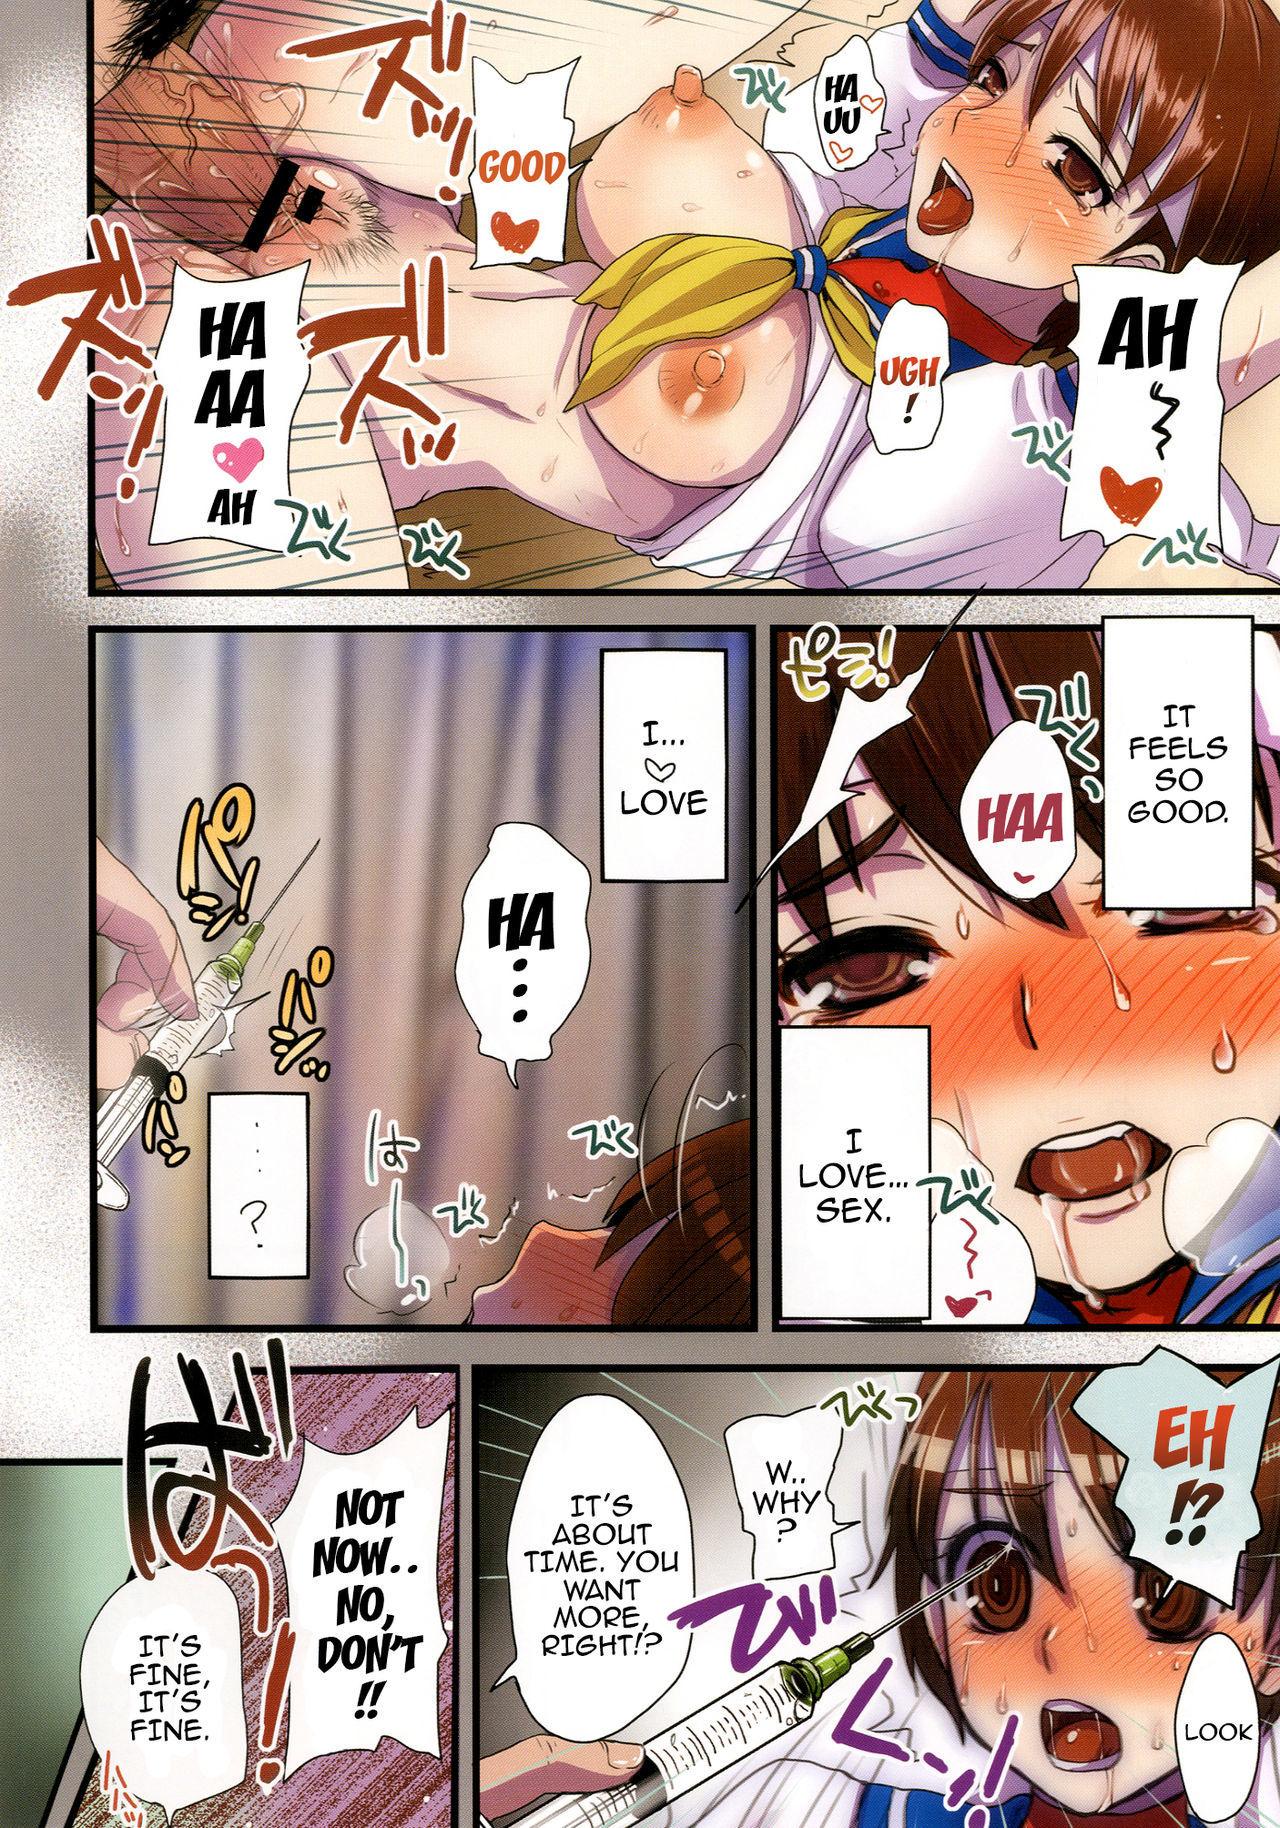 (C84) [Sarurururu (Doru Riheko)] Sakura Holic! (Street Fighter)  {doujin-moe.us}